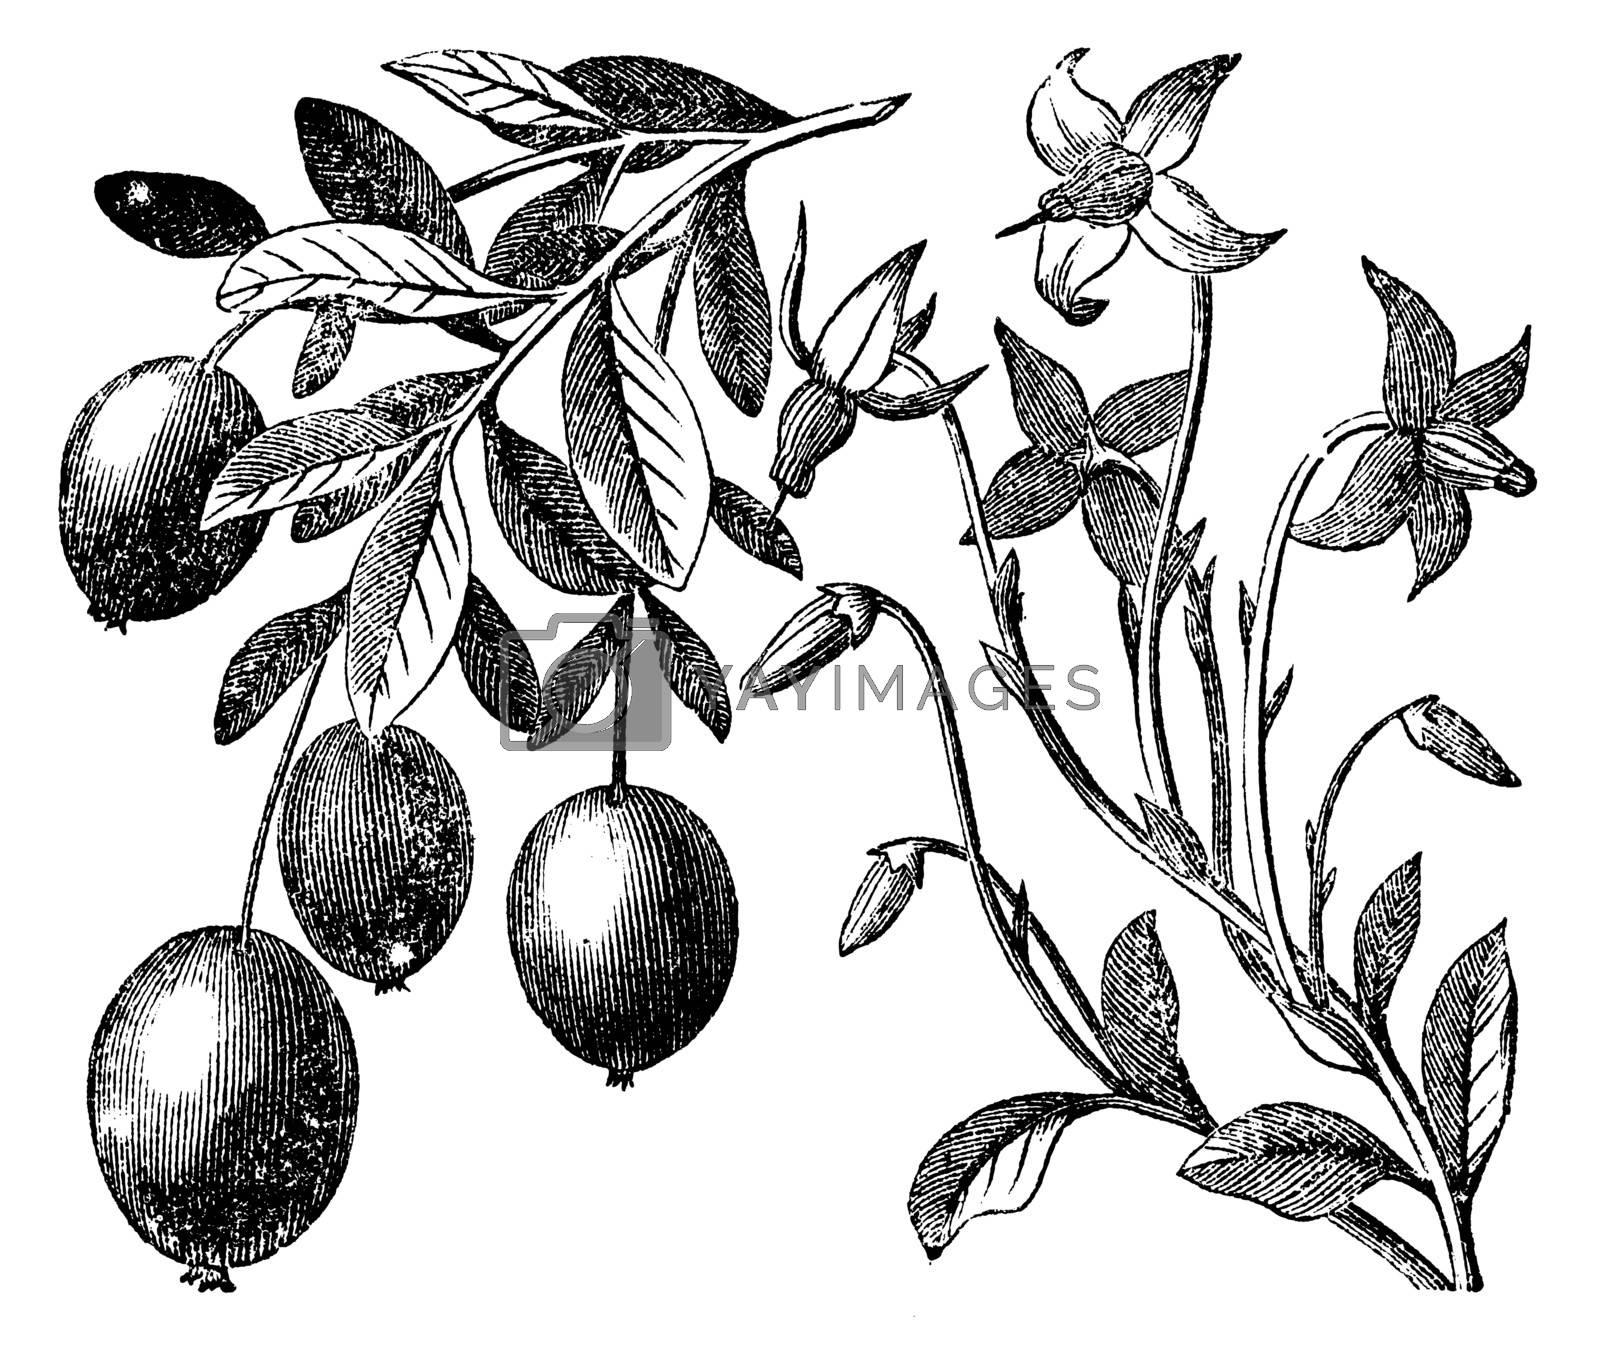 Cranberry vintage engraving. Old antique engraved illustration of cranberry plant.